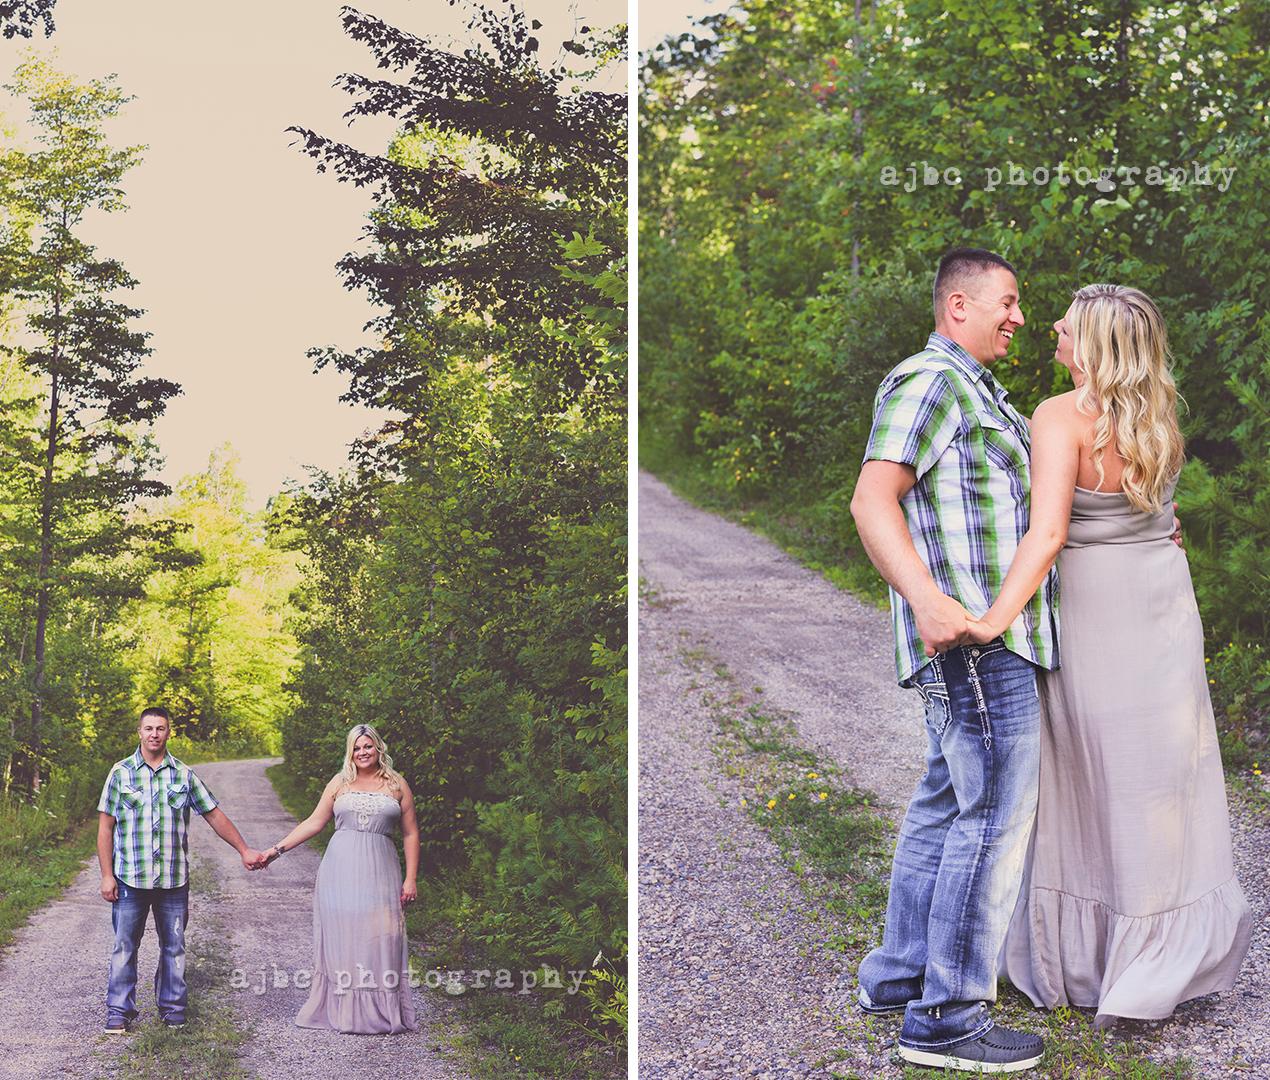 ajbcphotography_port huron_photographer_engagement_couples_love_outdoors